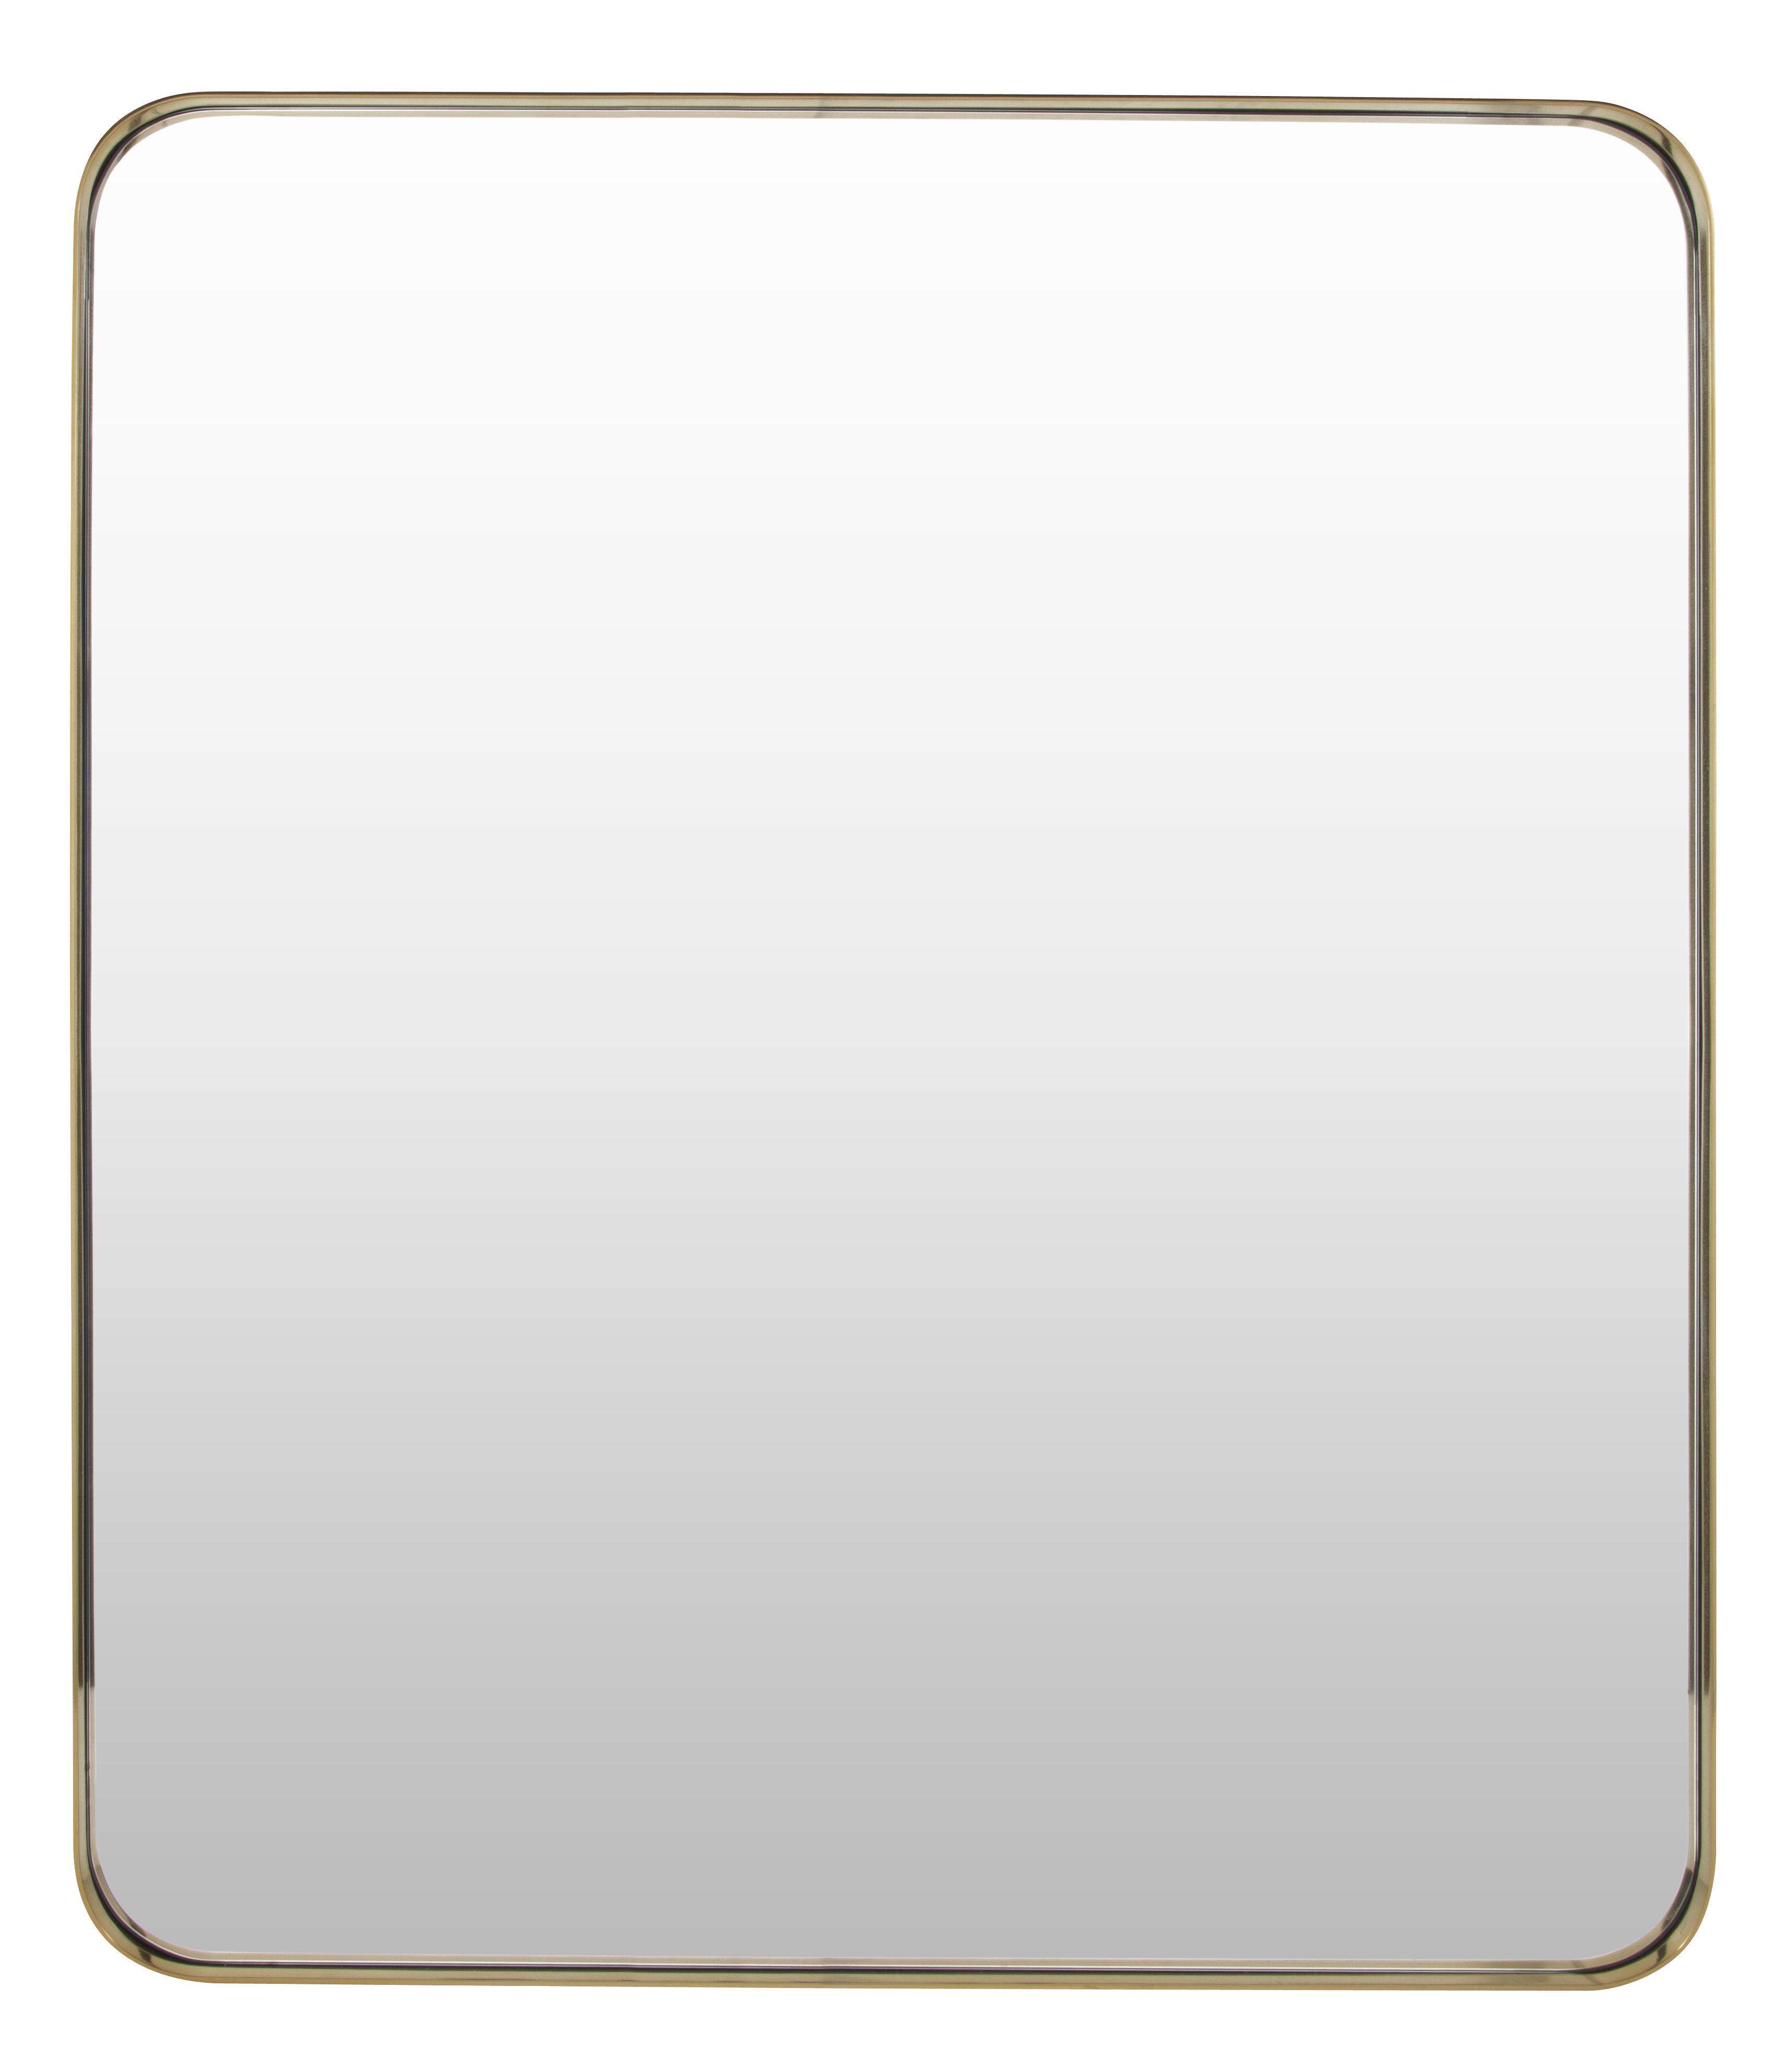 miroir hector 121 x 141 cm or maison sarah lavoine. Black Bedroom Furniture Sets. Home Design Ideas